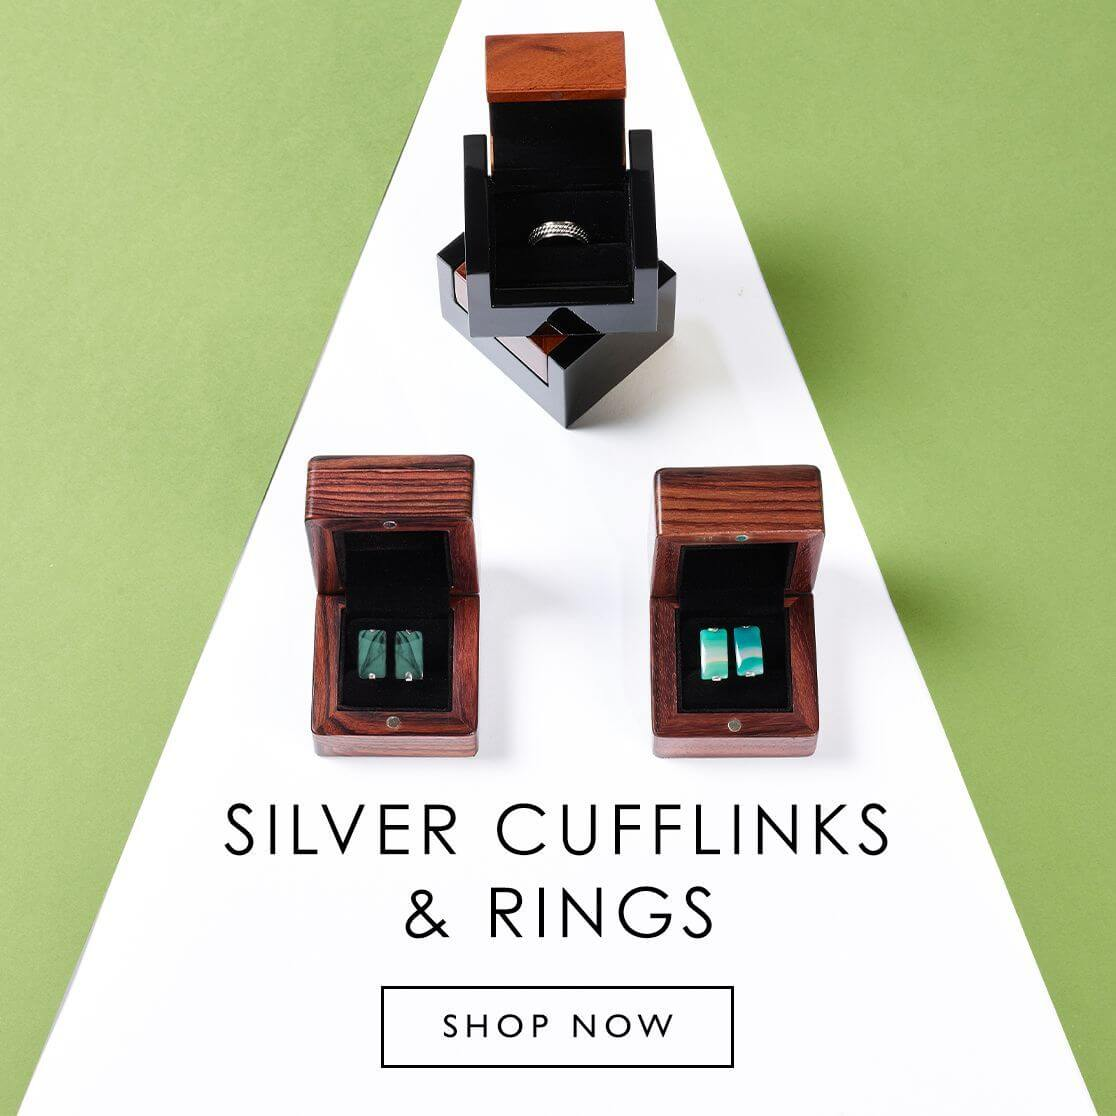 Silver Cufflinks & RIngs